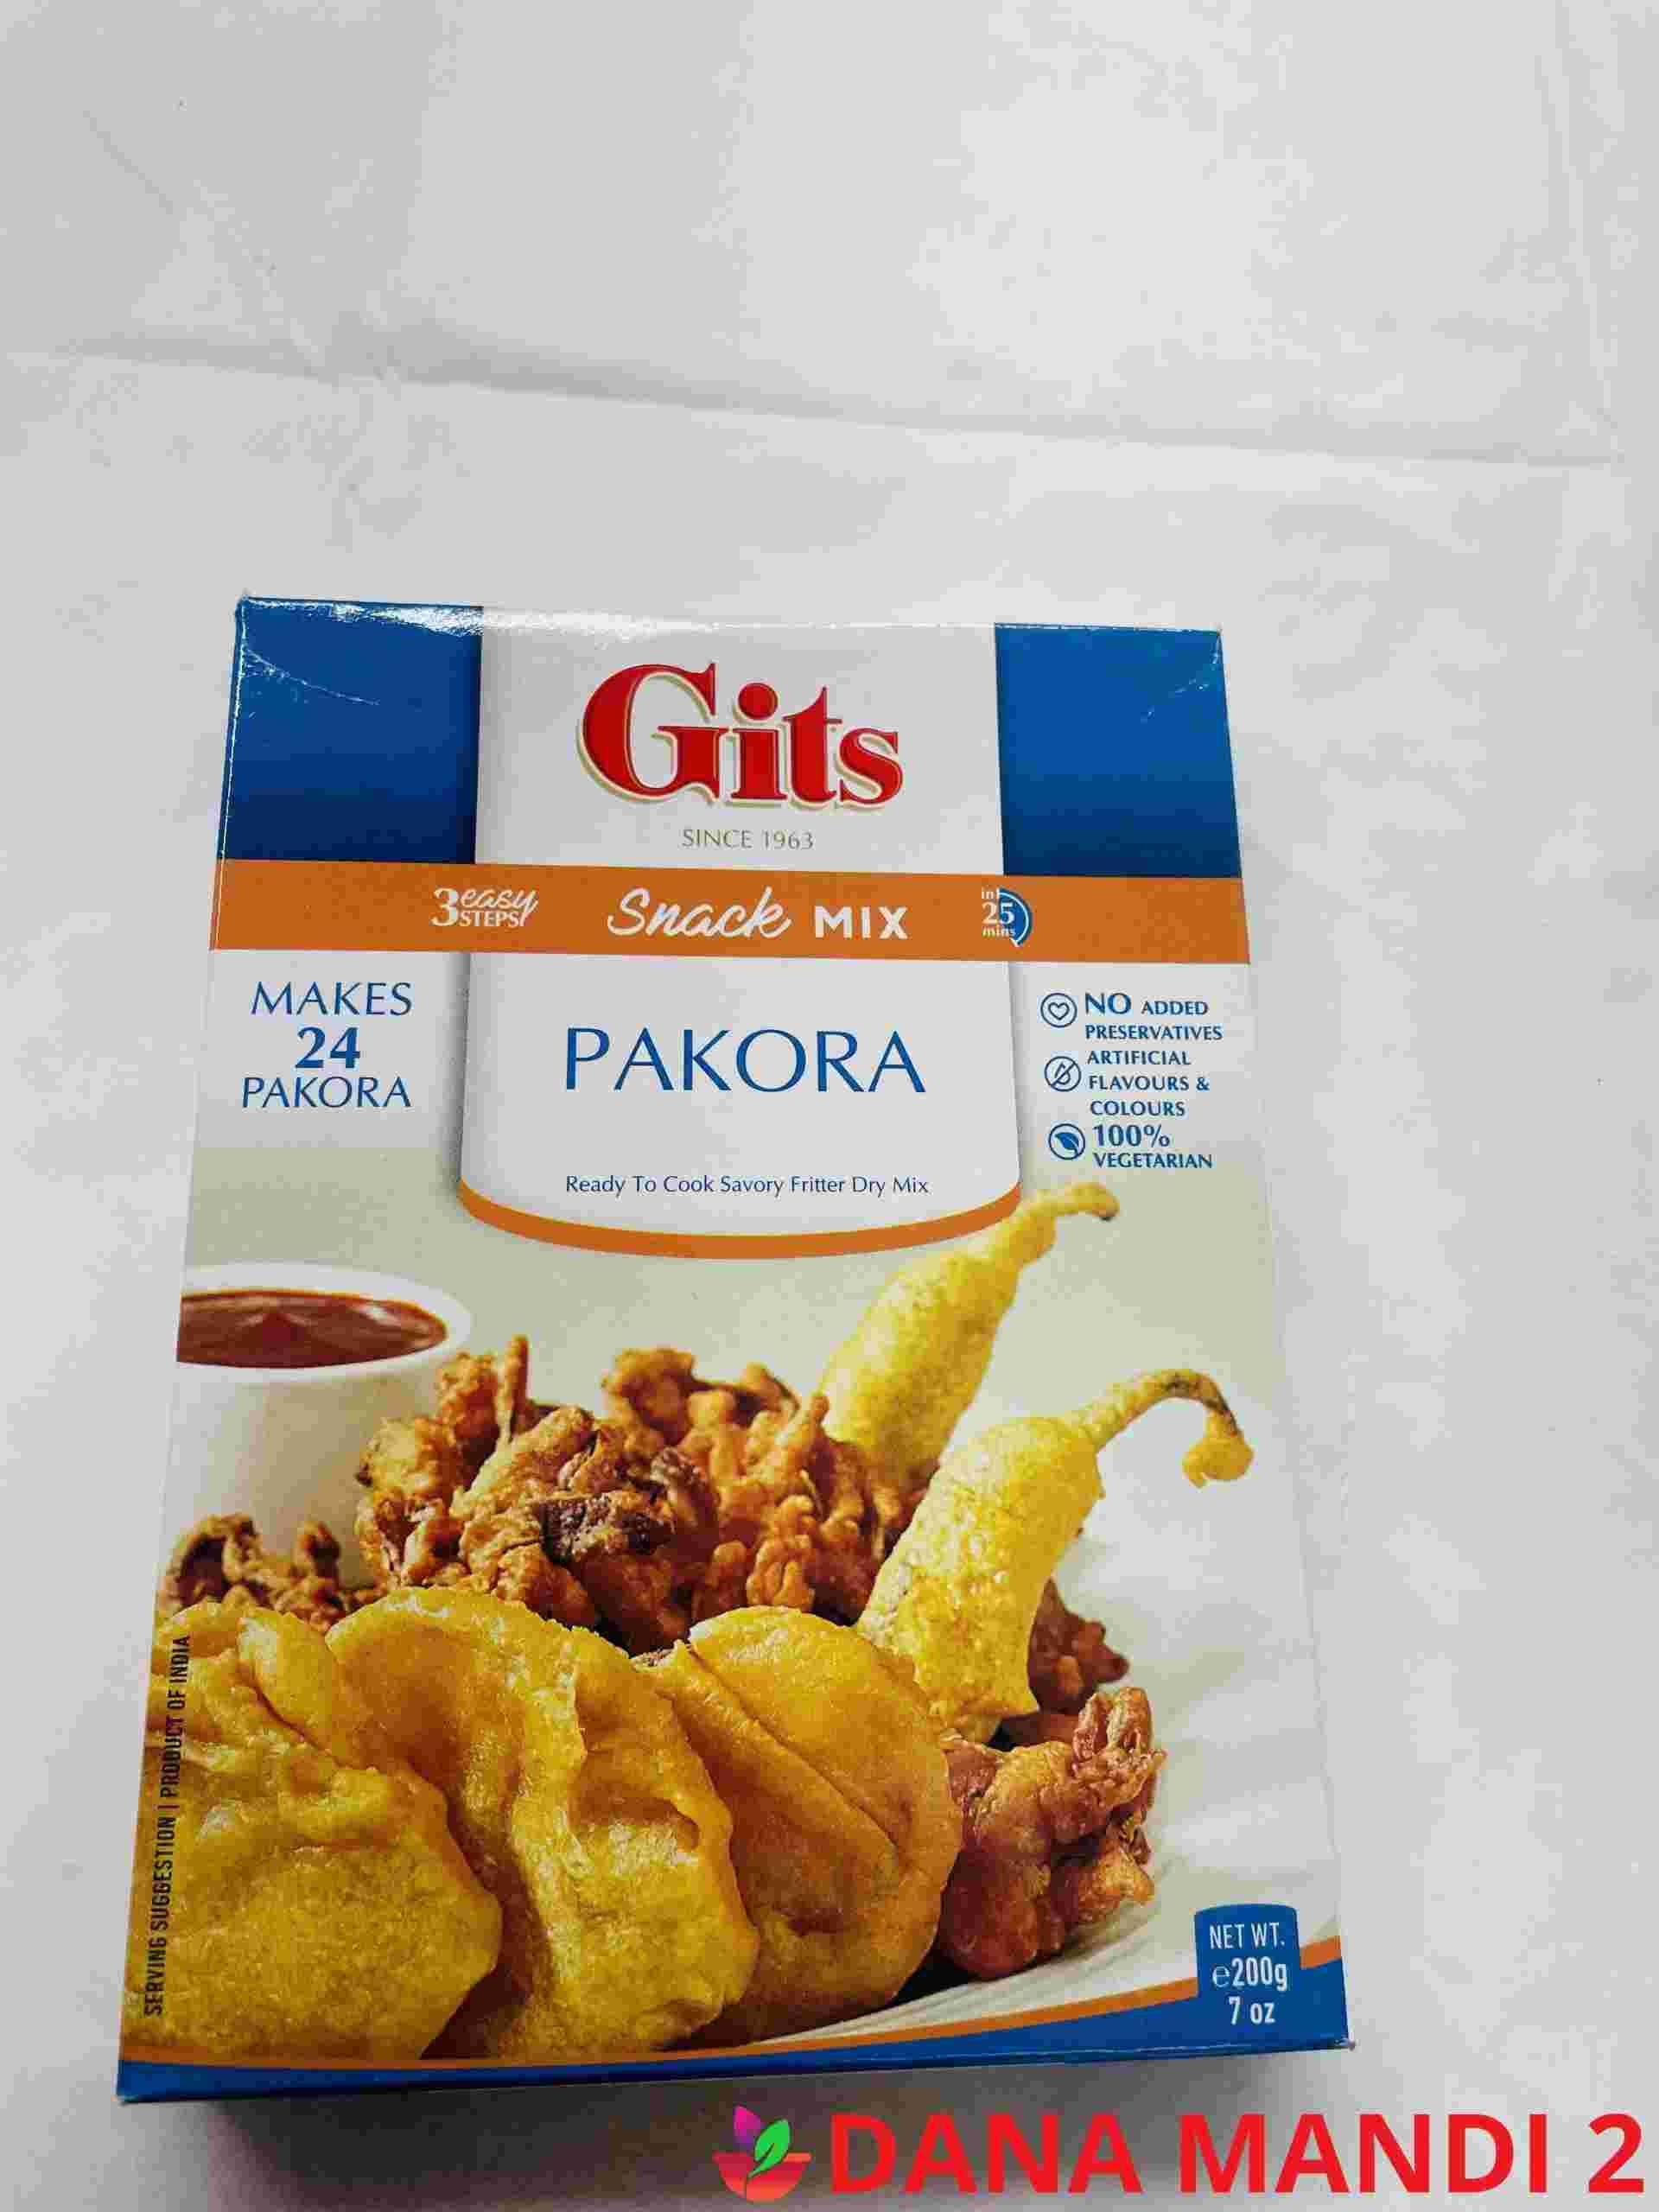 GITS Pakora Snack Mix